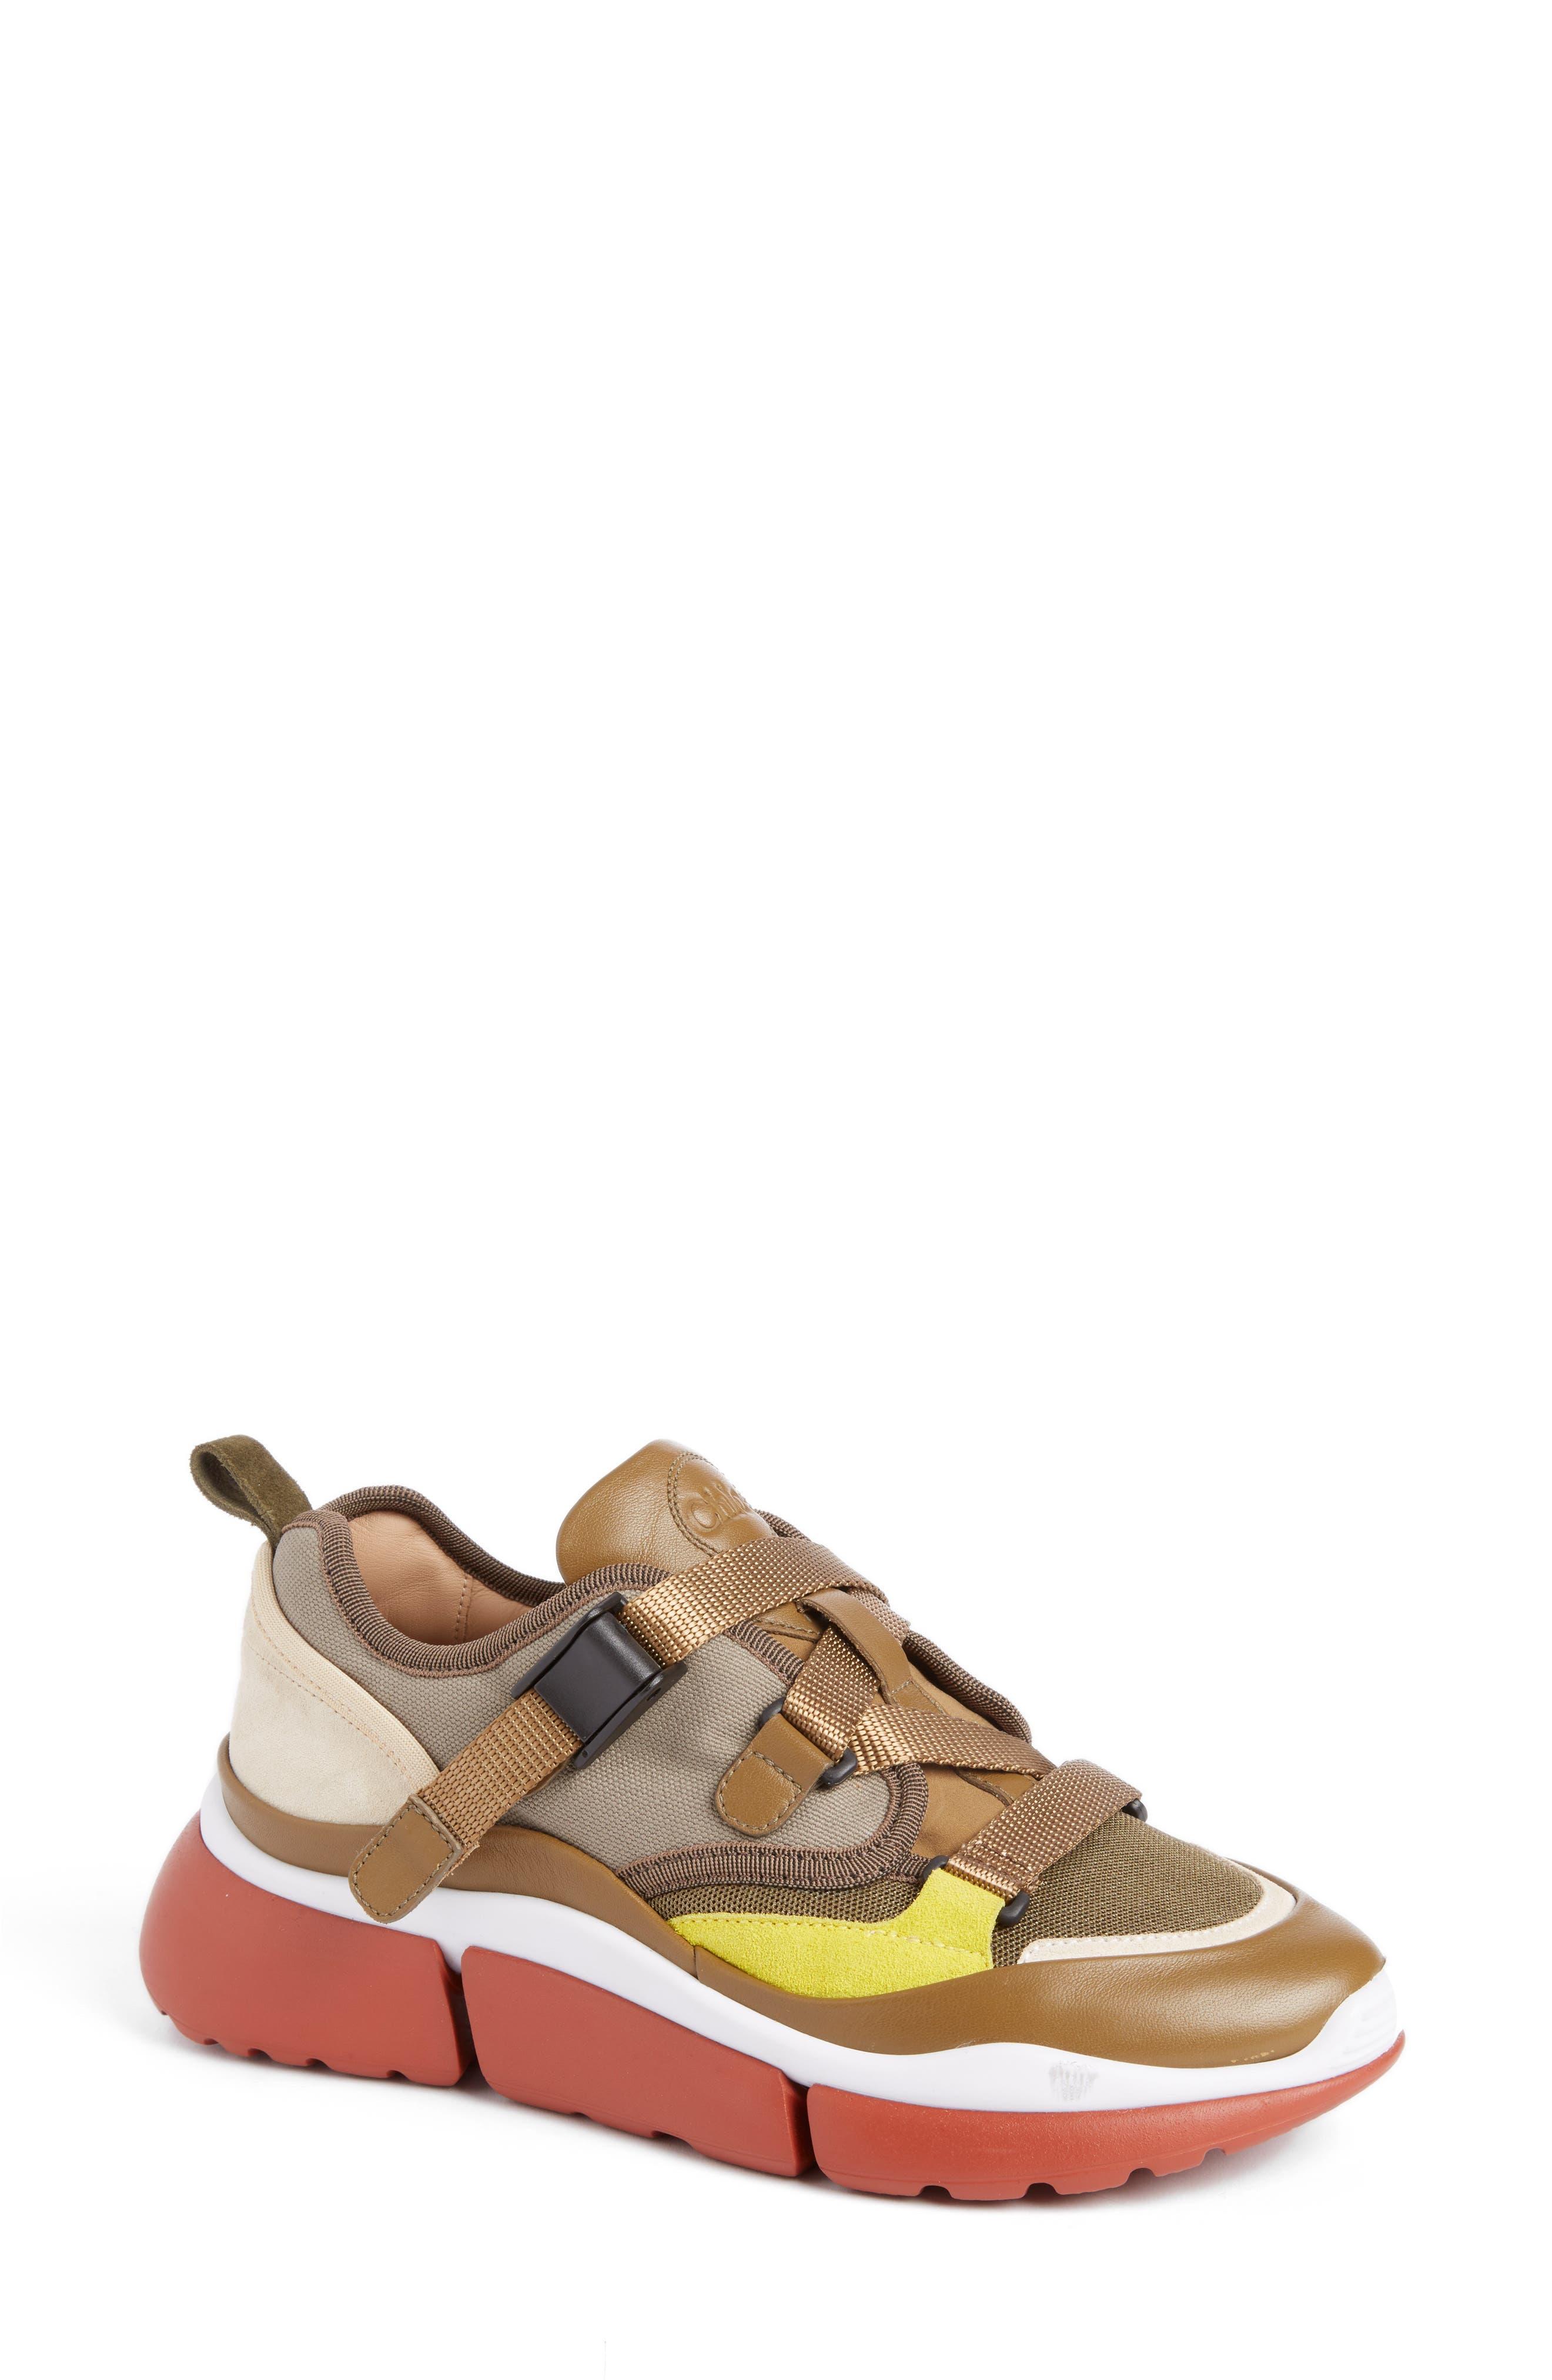 Sonnie Low Top Sneaker,                             Main thumbnail 1, color,                             Sooty Khaki